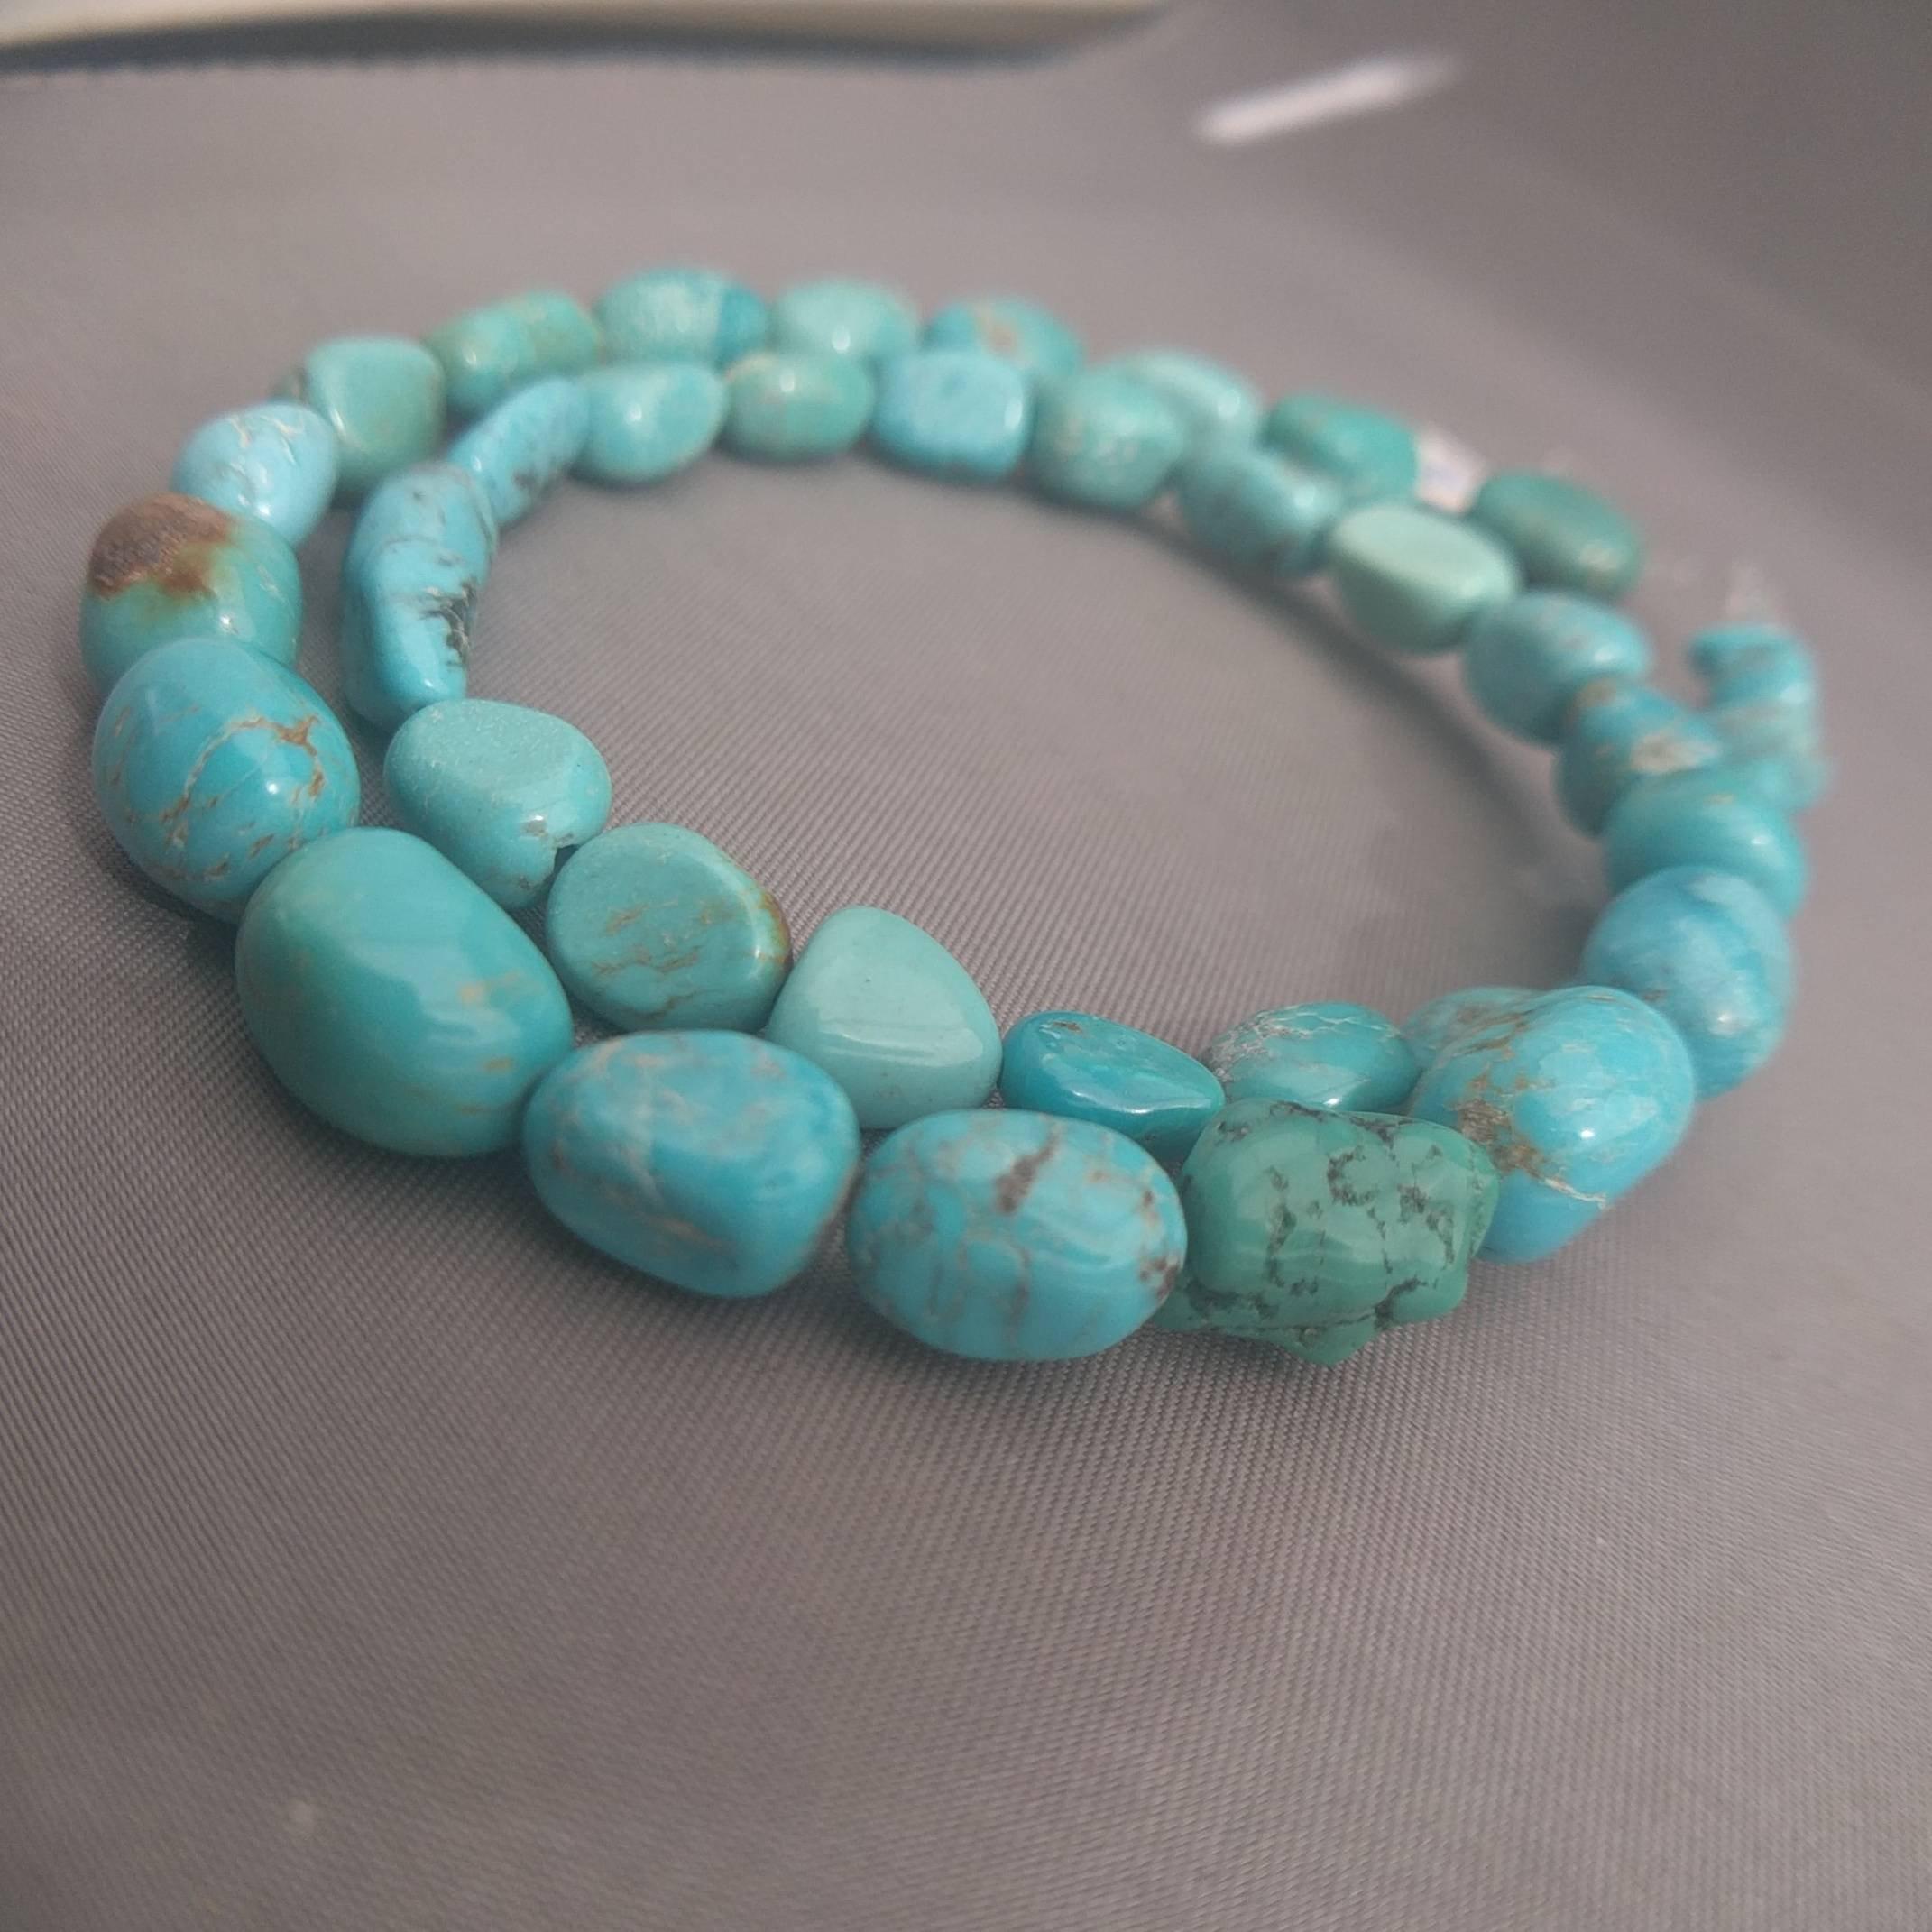 AA Genuine Kingman Turquoise Beads Stabilized Turquoise Nuggets Beads  American Turquoise Gemstone Beads Full 16